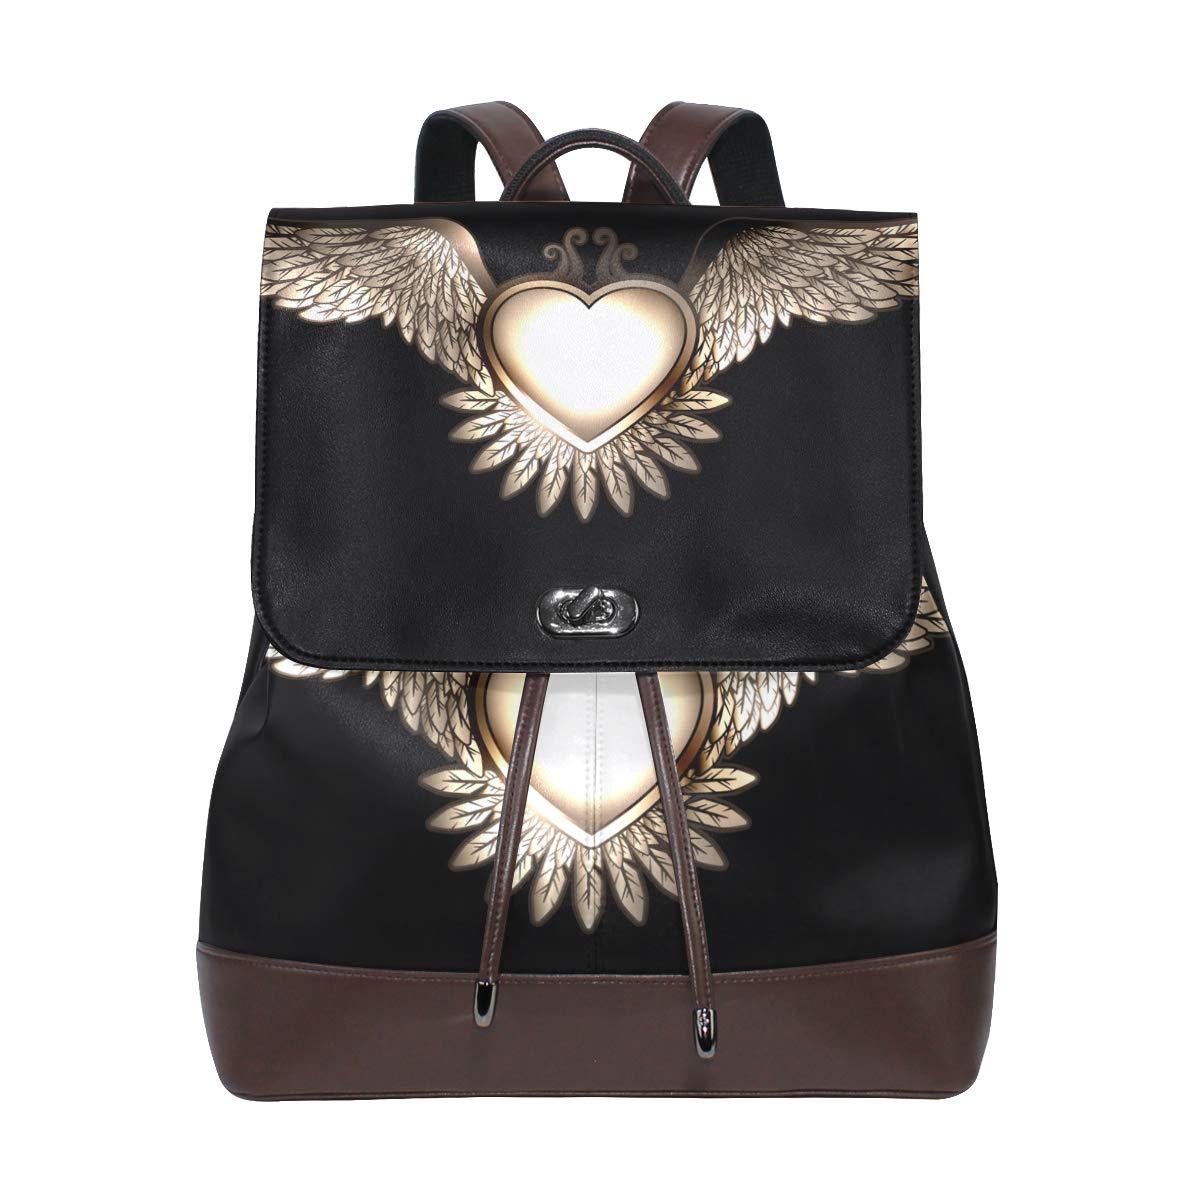 5bfa981835 FAJRO Heart Wingstravel Wingstravel Wingstravel zaino borsa scuola  confezione 023bf5